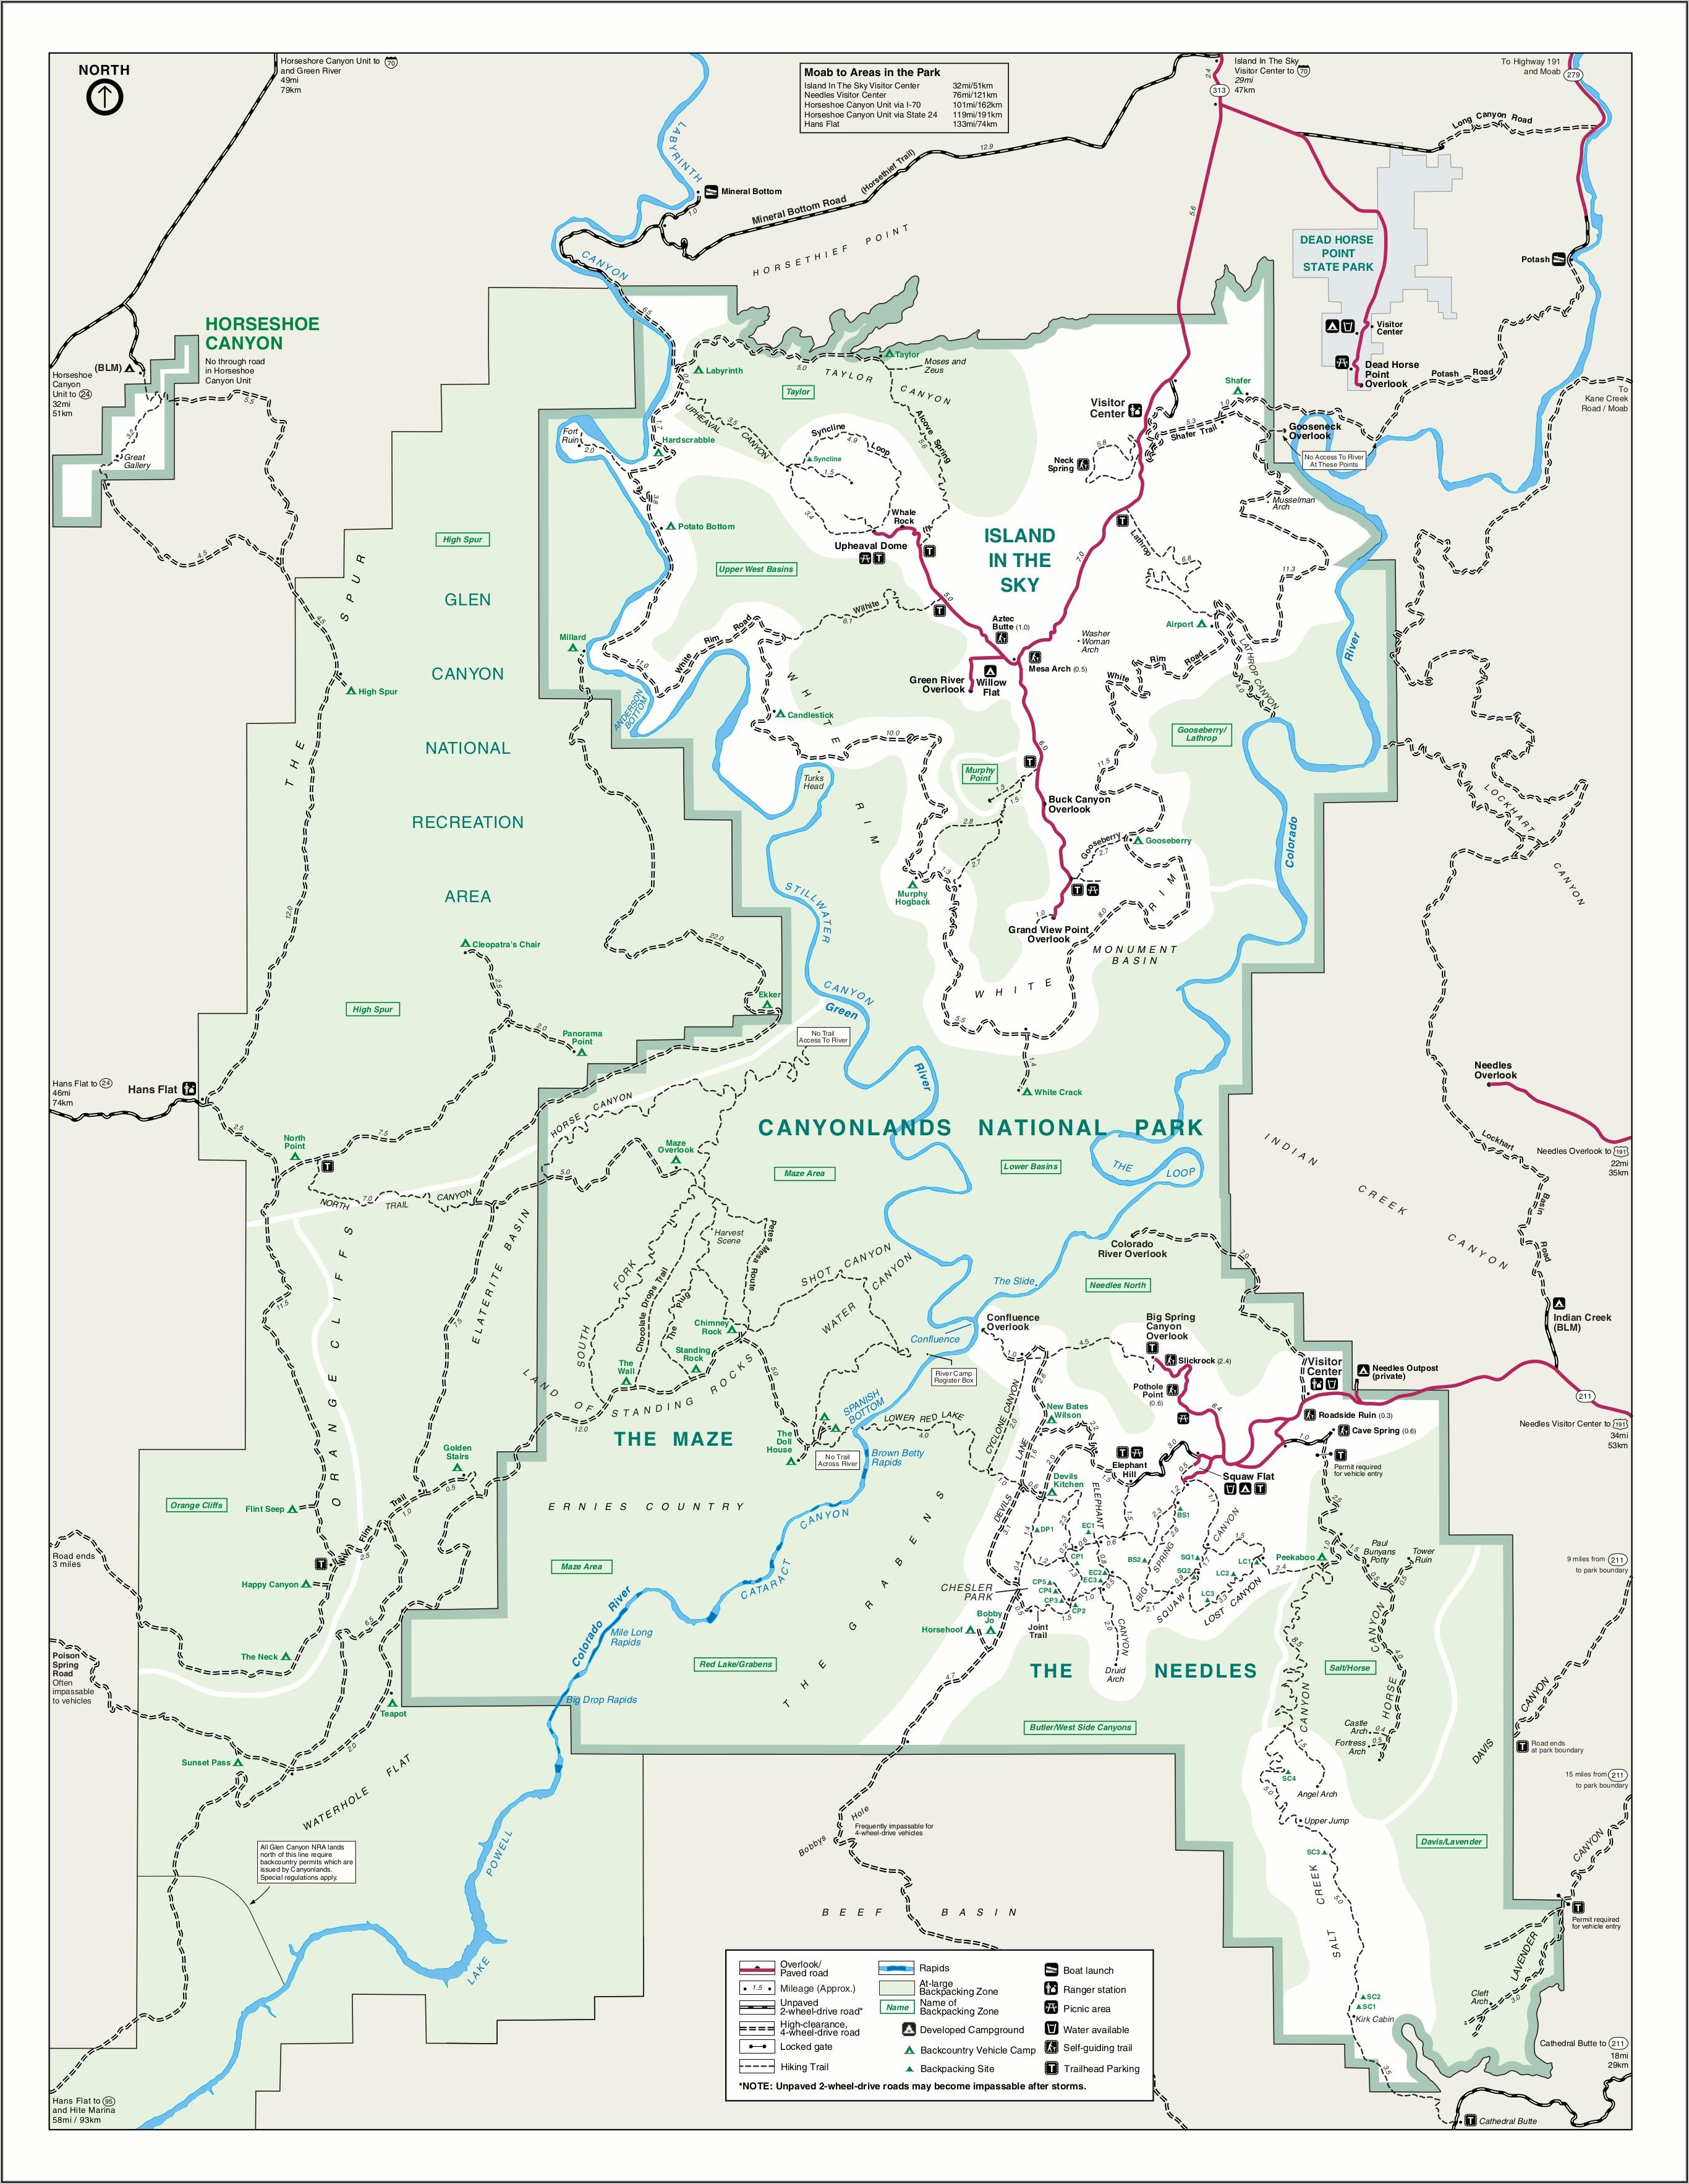 Canyonlands National Park Printable Map